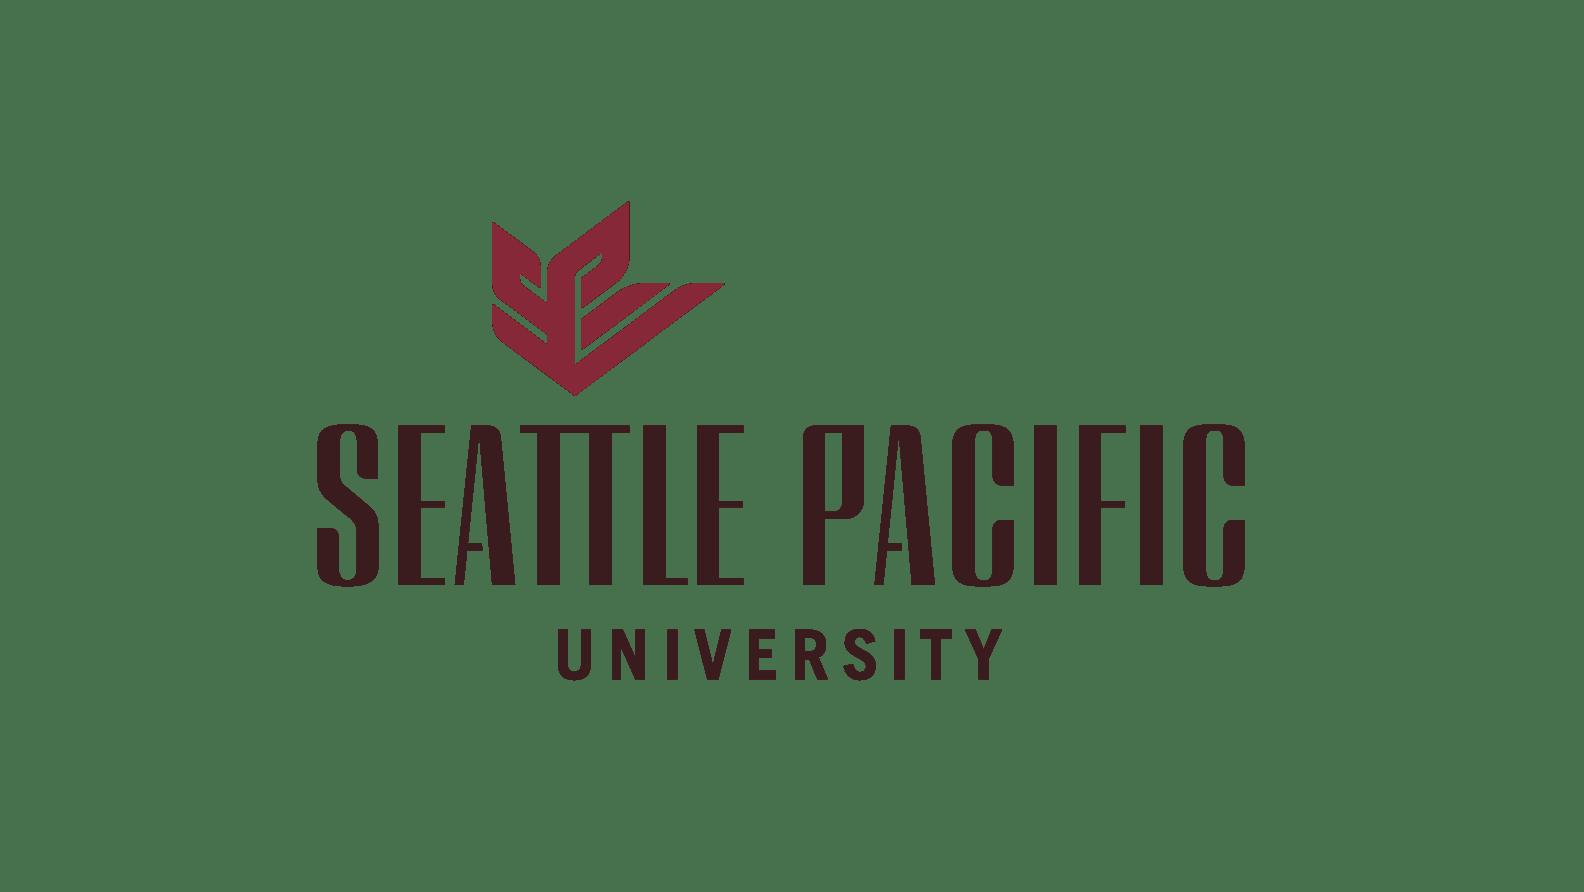 Seattle Pacific University logo-details-main